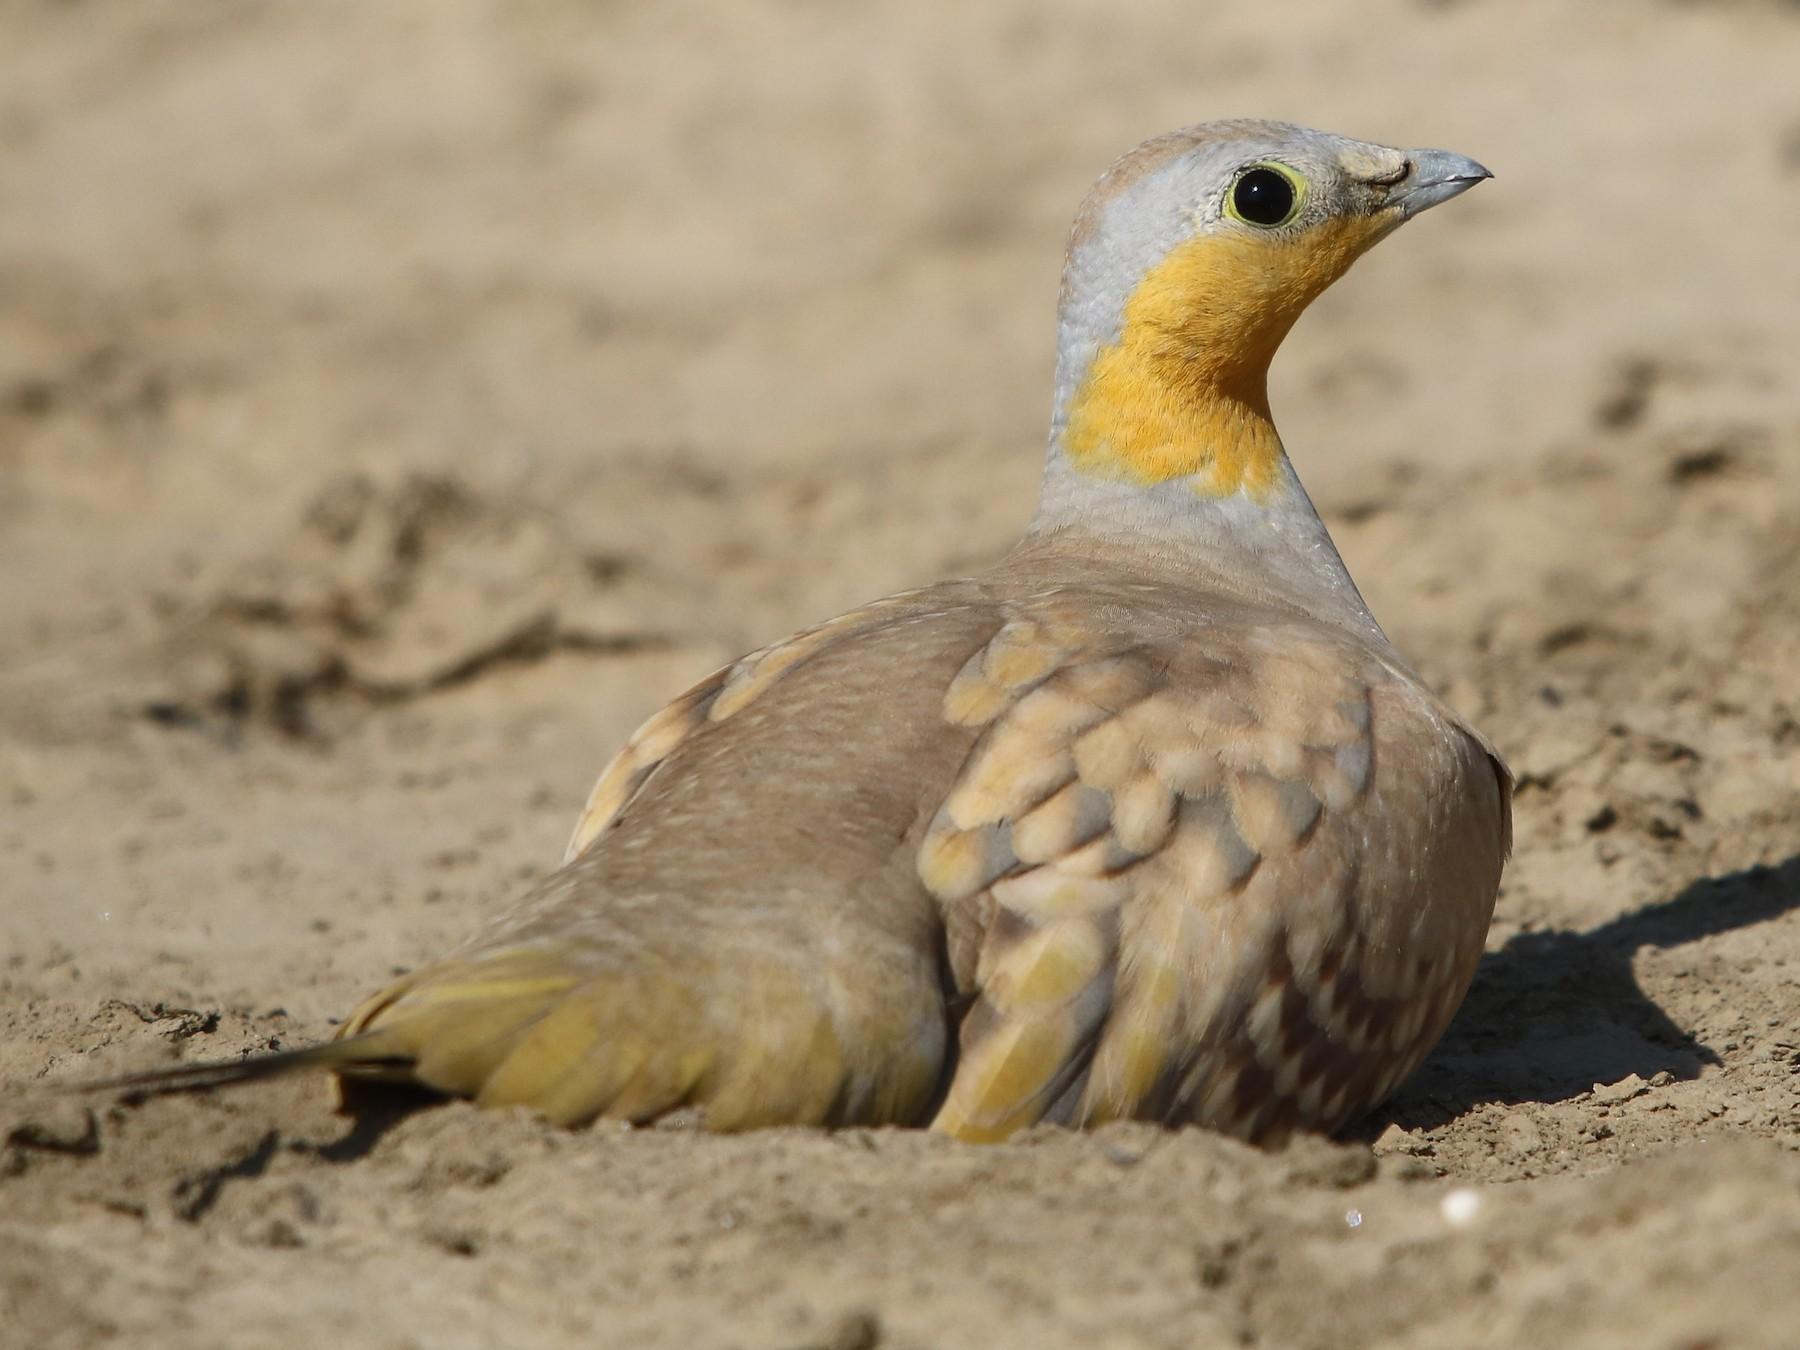 Spotted Sandgrouse - Bhaarat Vyas